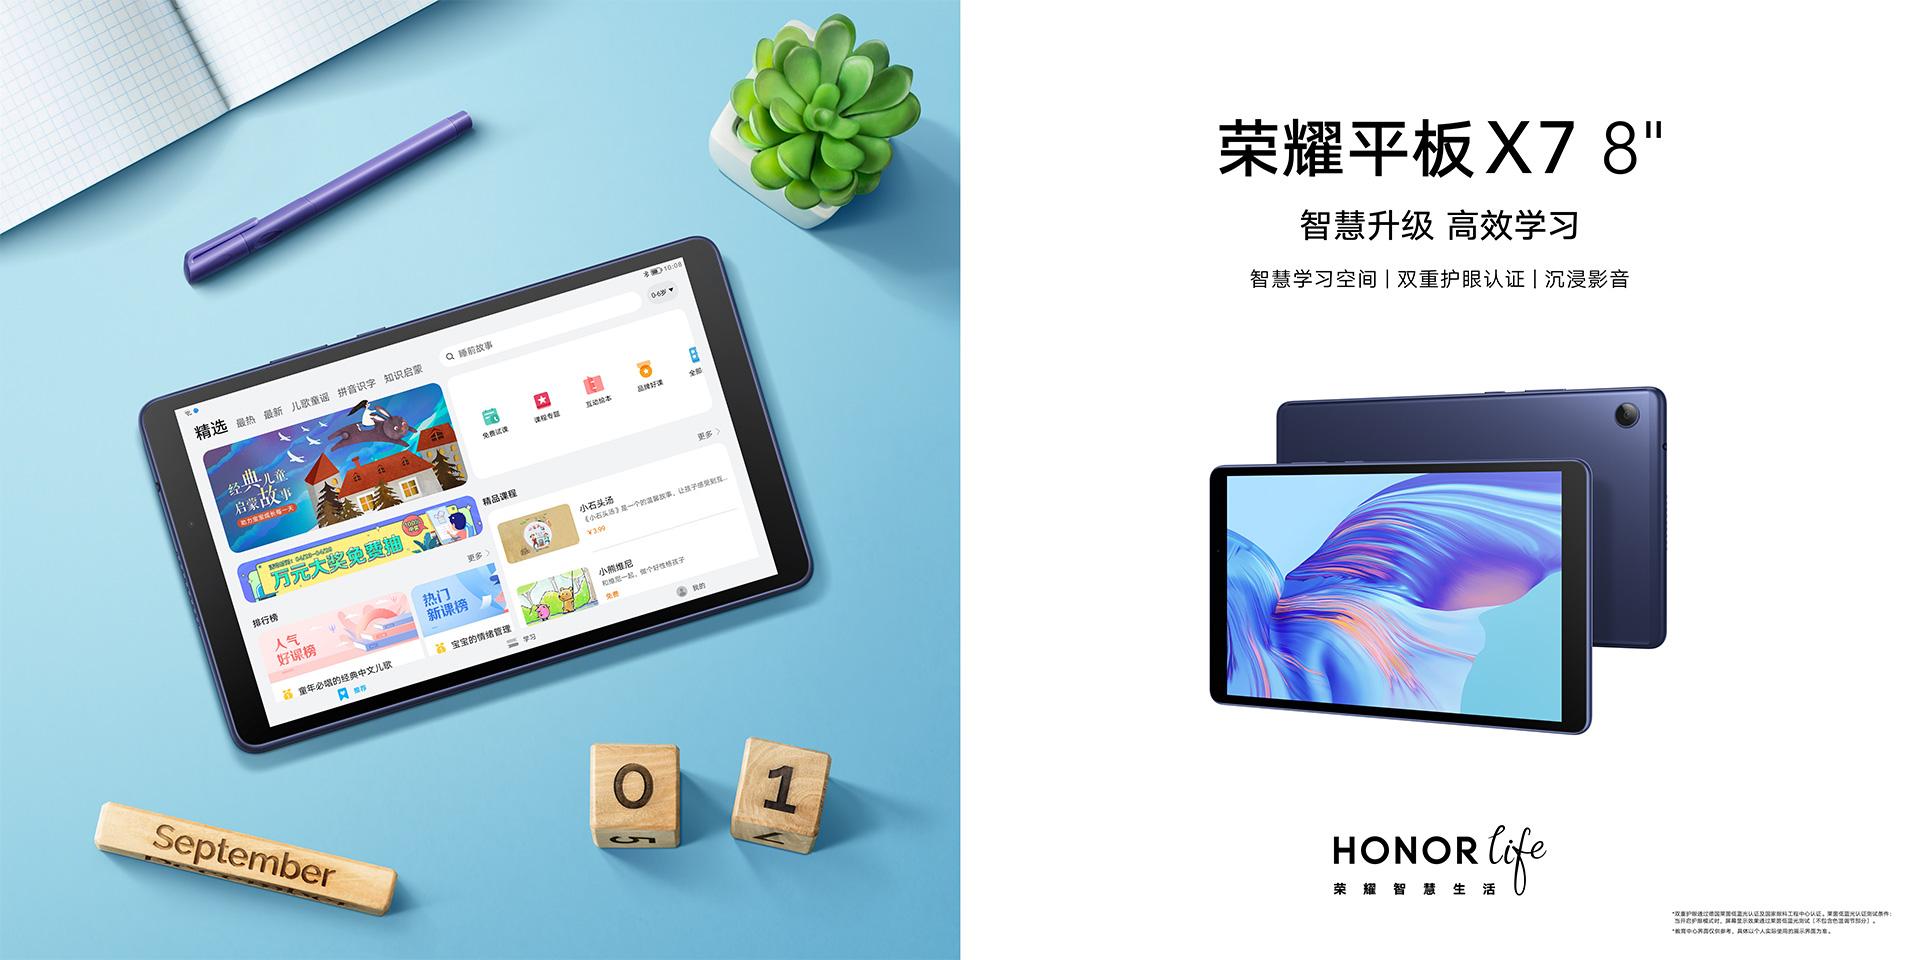 Honor Tab X7 2 1920x960x